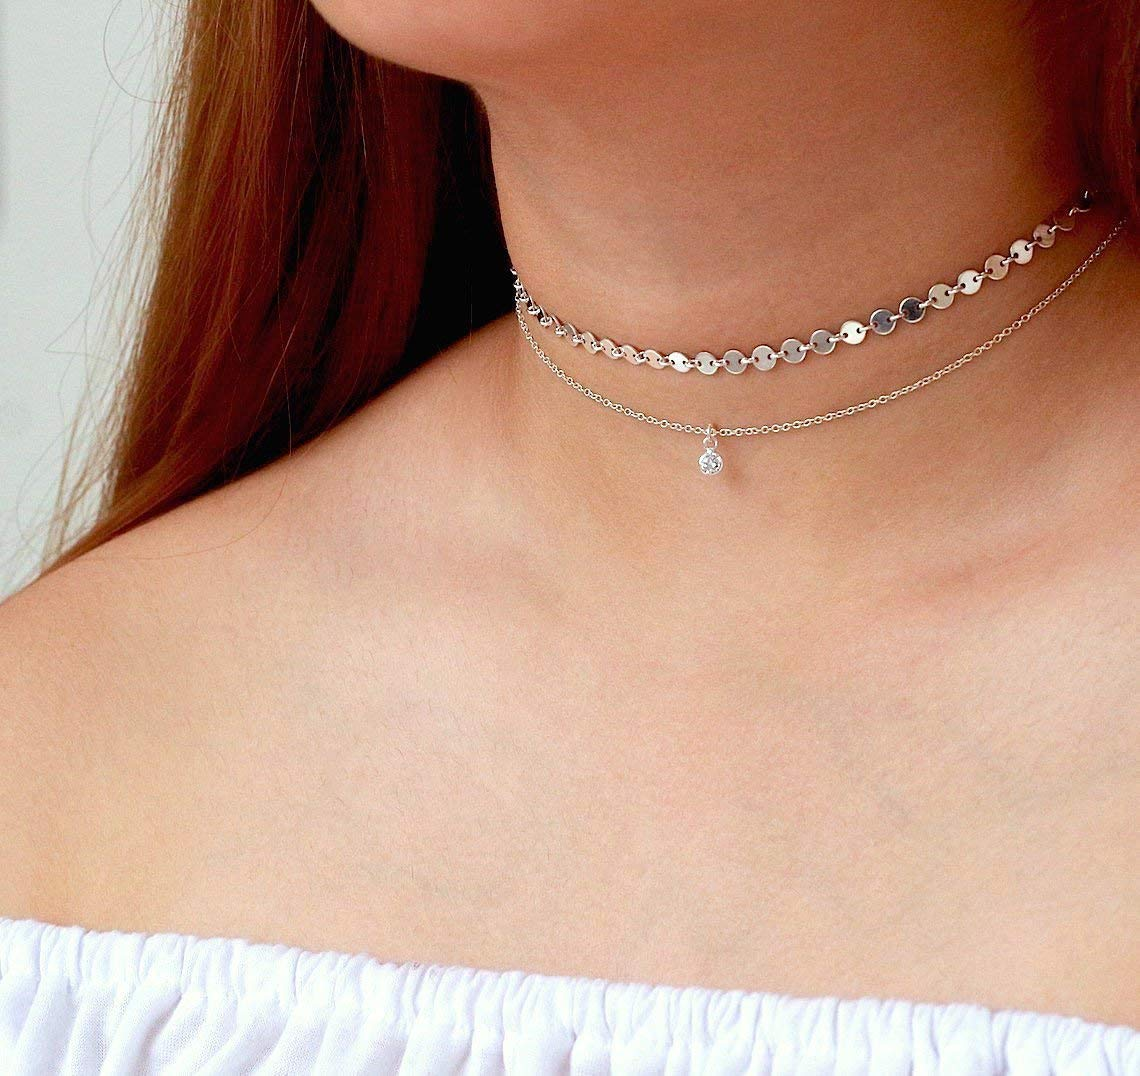 Handmade Choker Necklace Swarowski Crystals